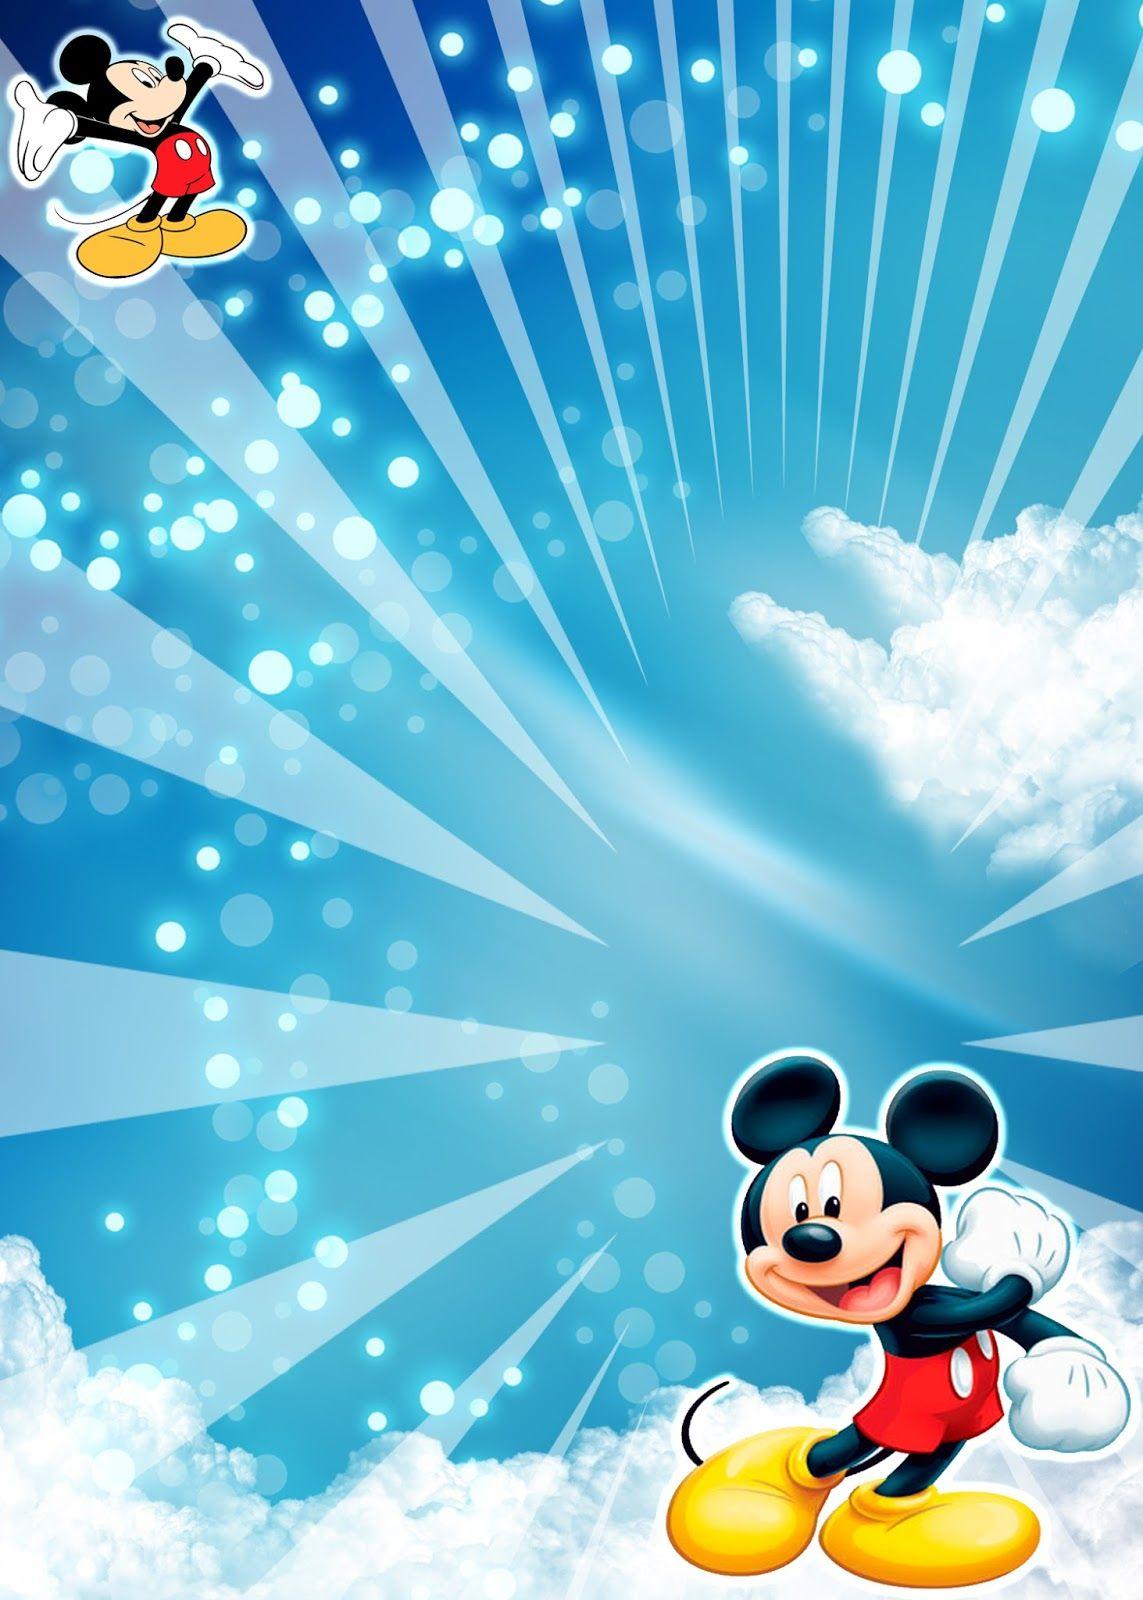 Invitacion-mickey-mouse-azul-gratis-descargarjpg (1143×